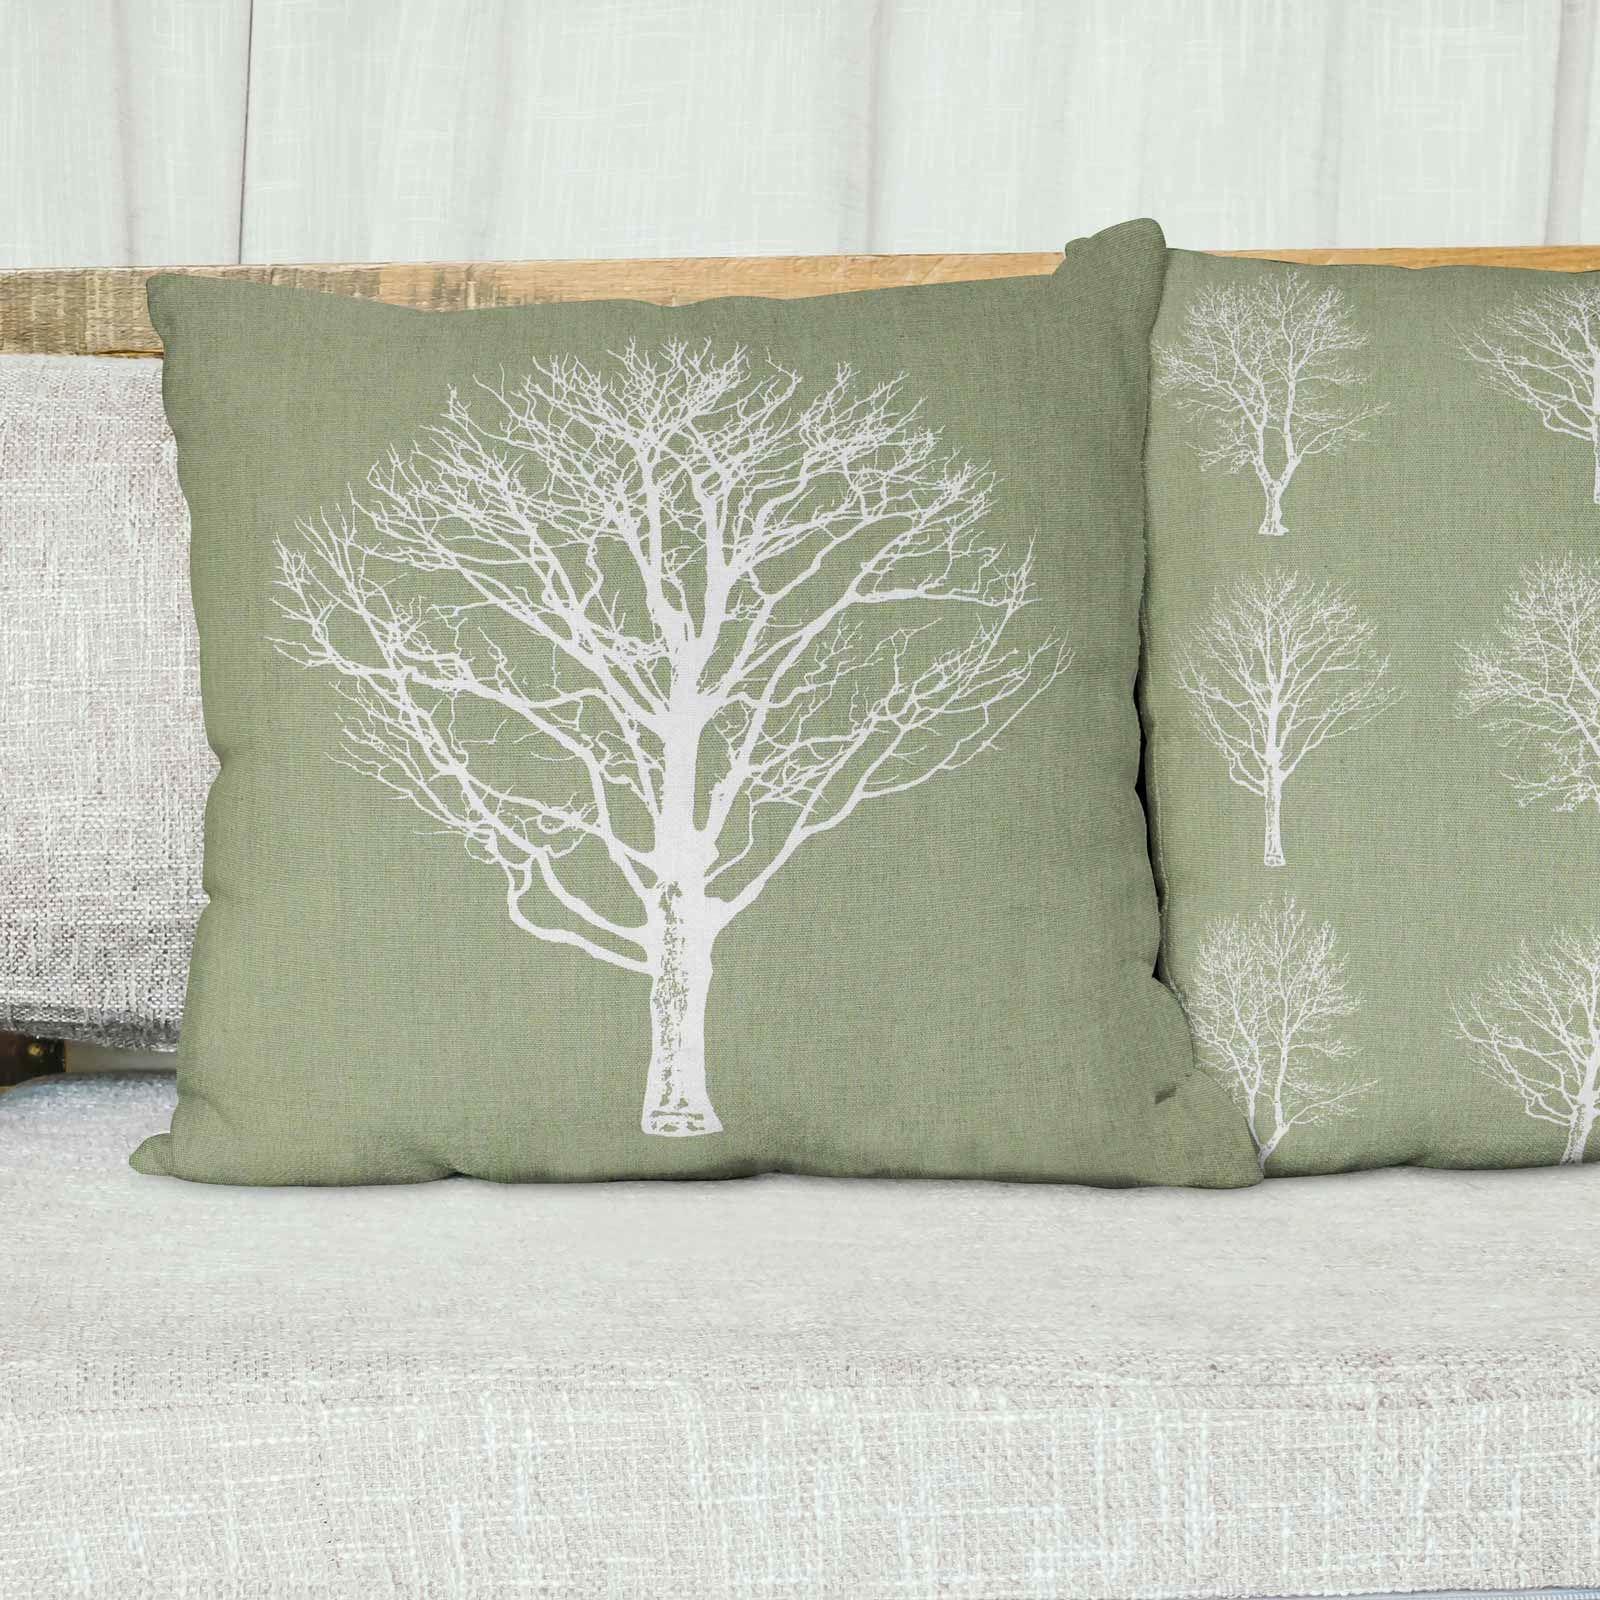 Woodland-Trees-Cushion-Cover-Modern-Reversible-Tree-Print-Covers-17-034-x-17-034 thumbnail 29